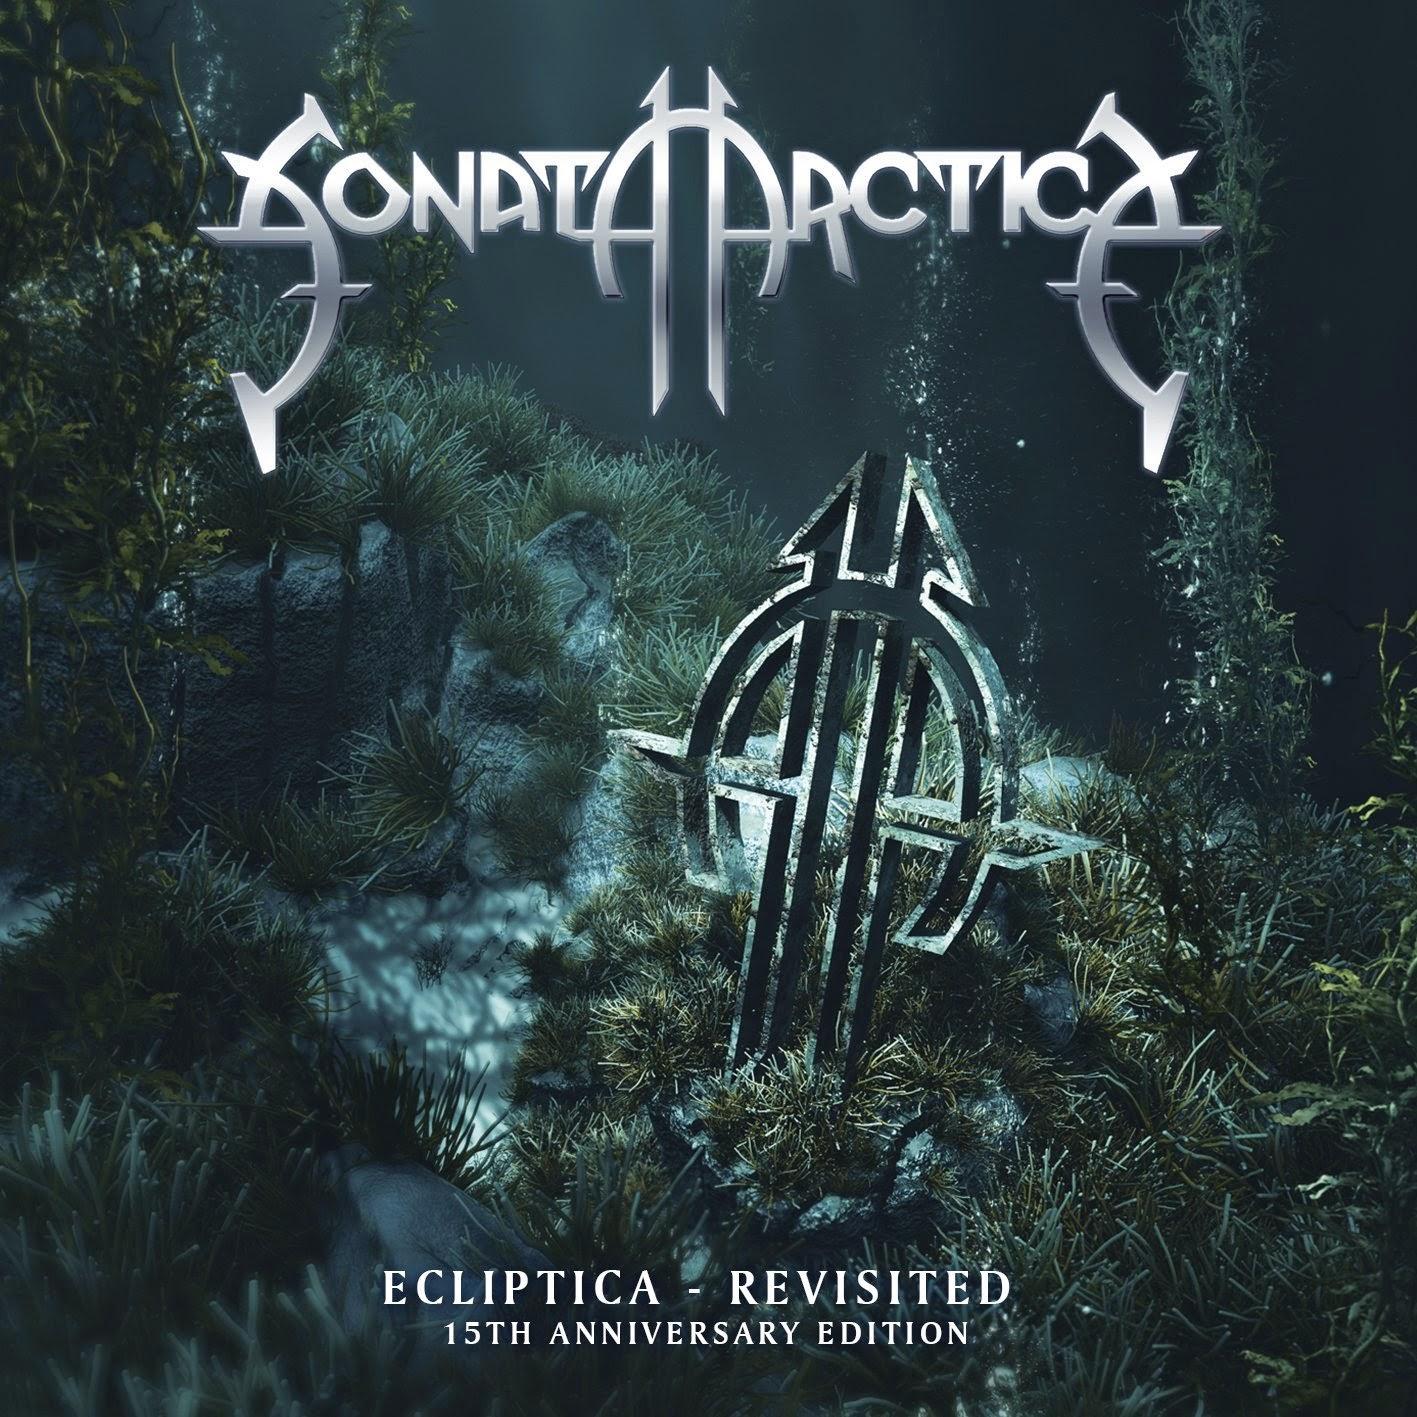 http://rock-and-metal-4-you.blogspot.de/2014/10/cd-review-sonata-arctica-ecliptica-revisited.html